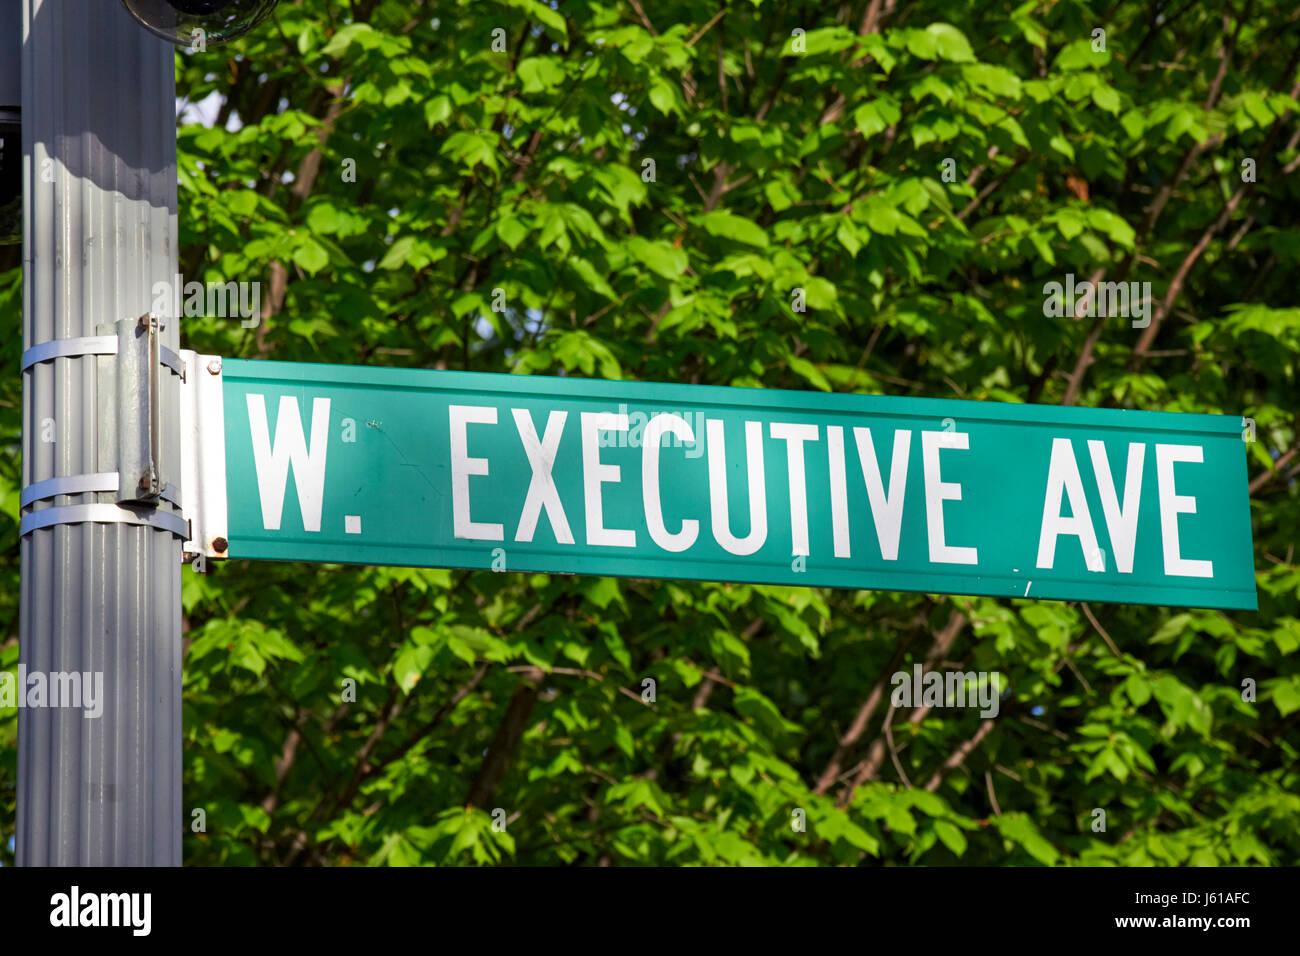 streetsign for west executive avenue at the whitehouse Washington DC USA - Stock Image